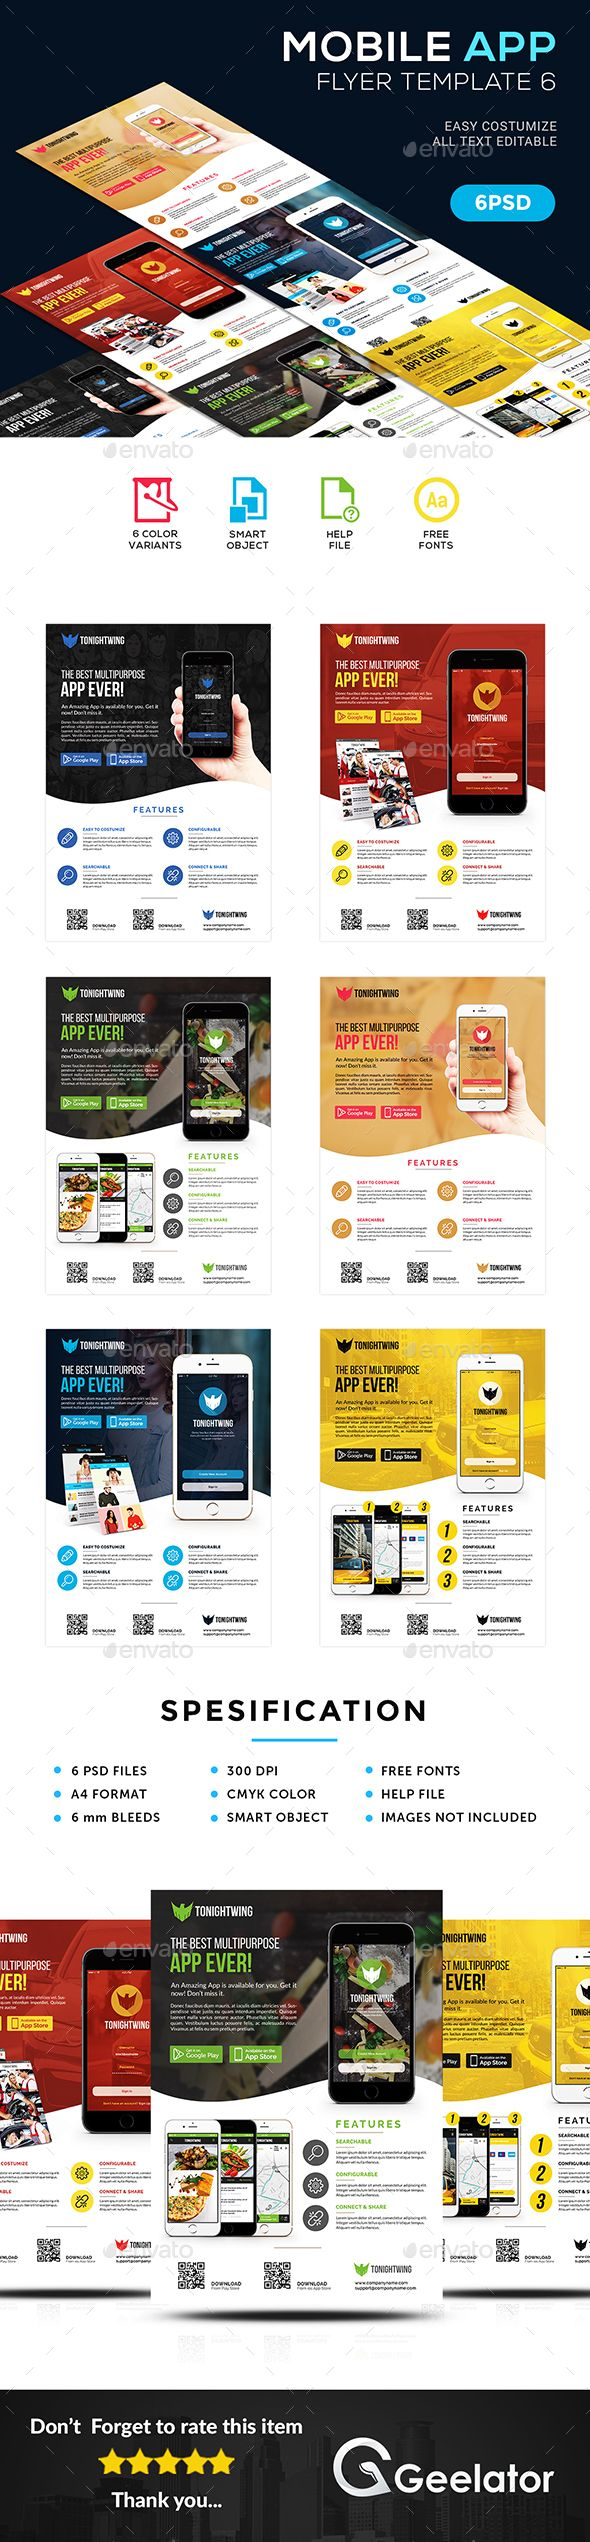 #Mobile #App #Flyer Template 6 - Commerce Flyers Download here: https://graphicriver.net/item/mobile-app-flyer-template-6/19554983?ref=alena994